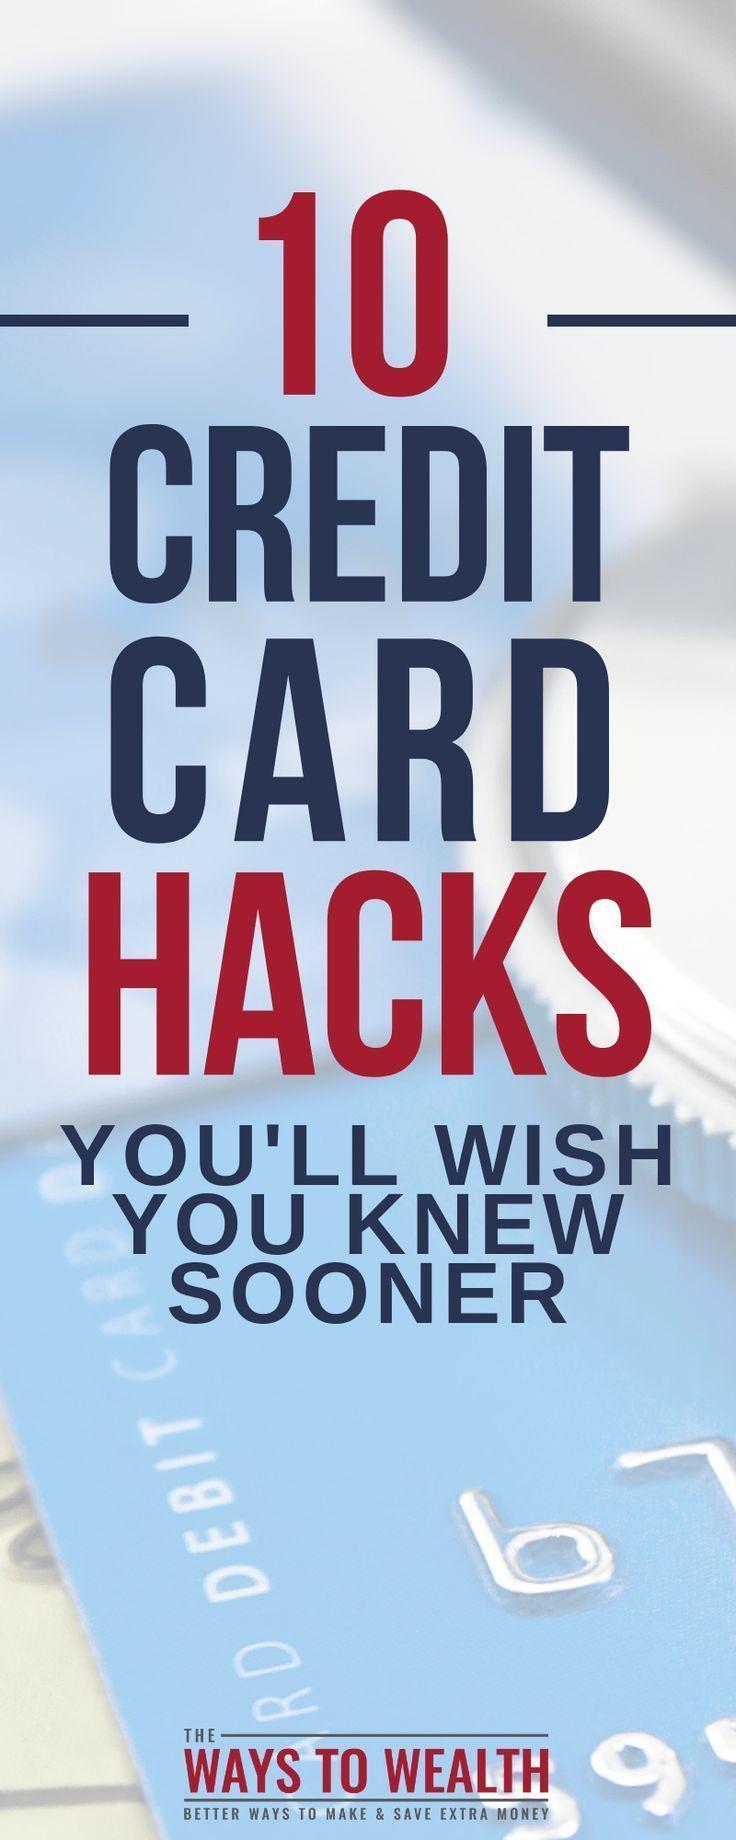 #personalfinancetips #creditcardtips #maximizing #rewards #sooner